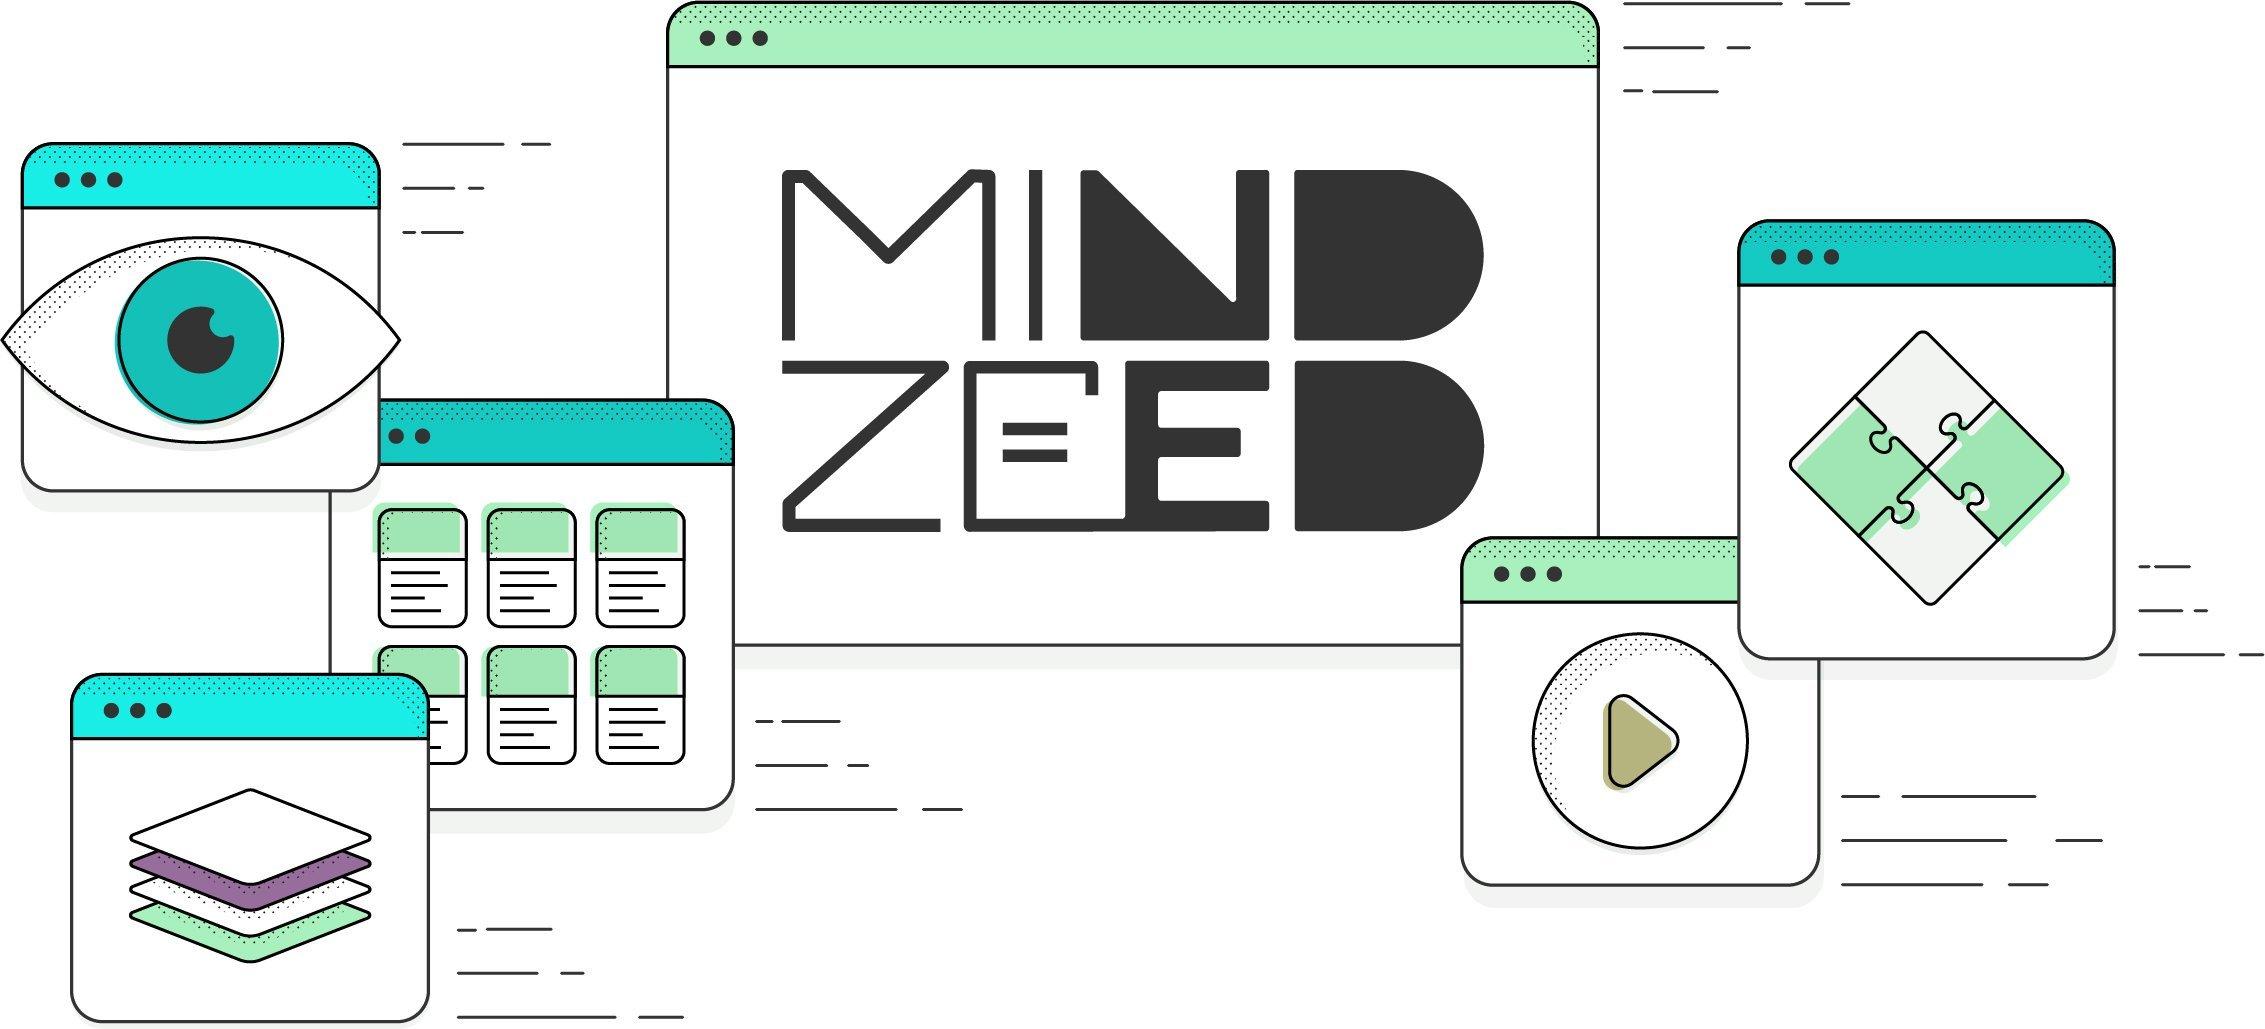 mindzeed-main-100